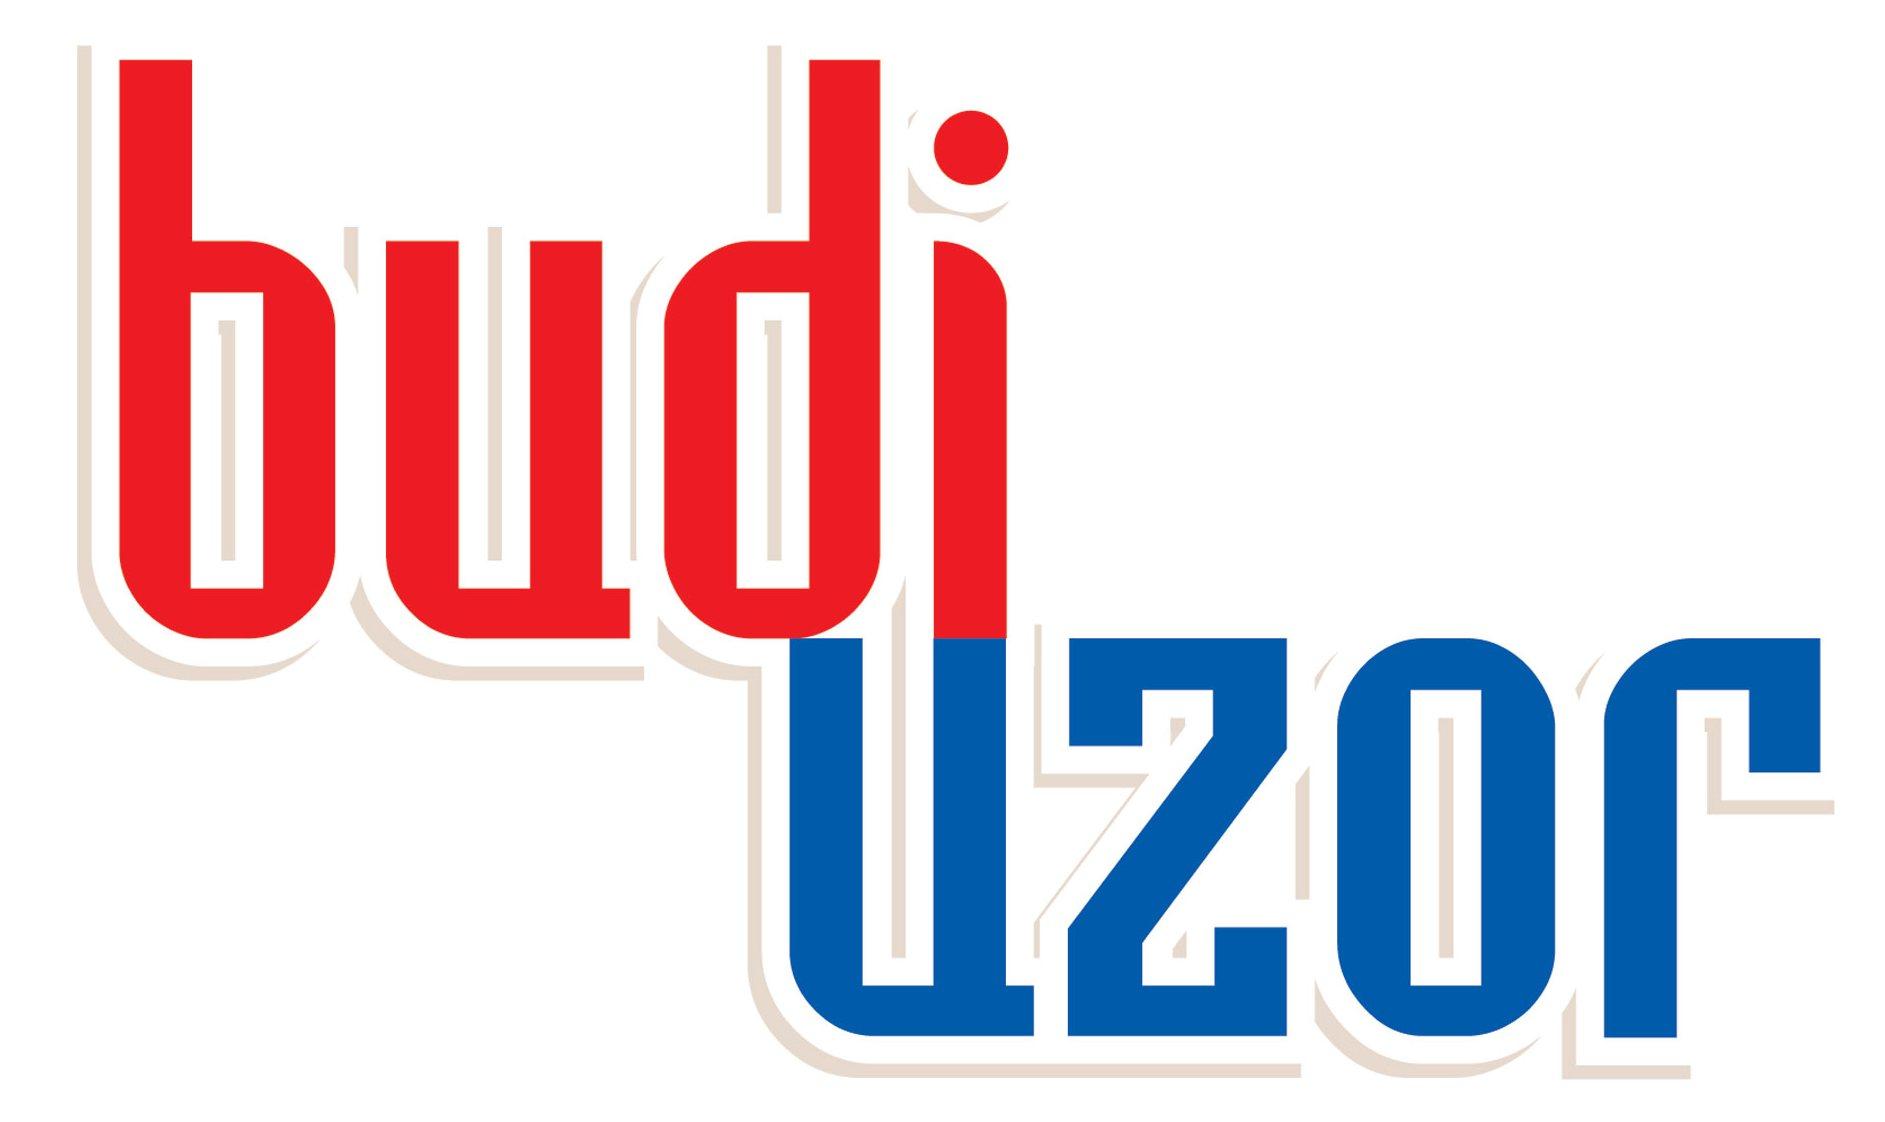 Projekt: BudiUzor